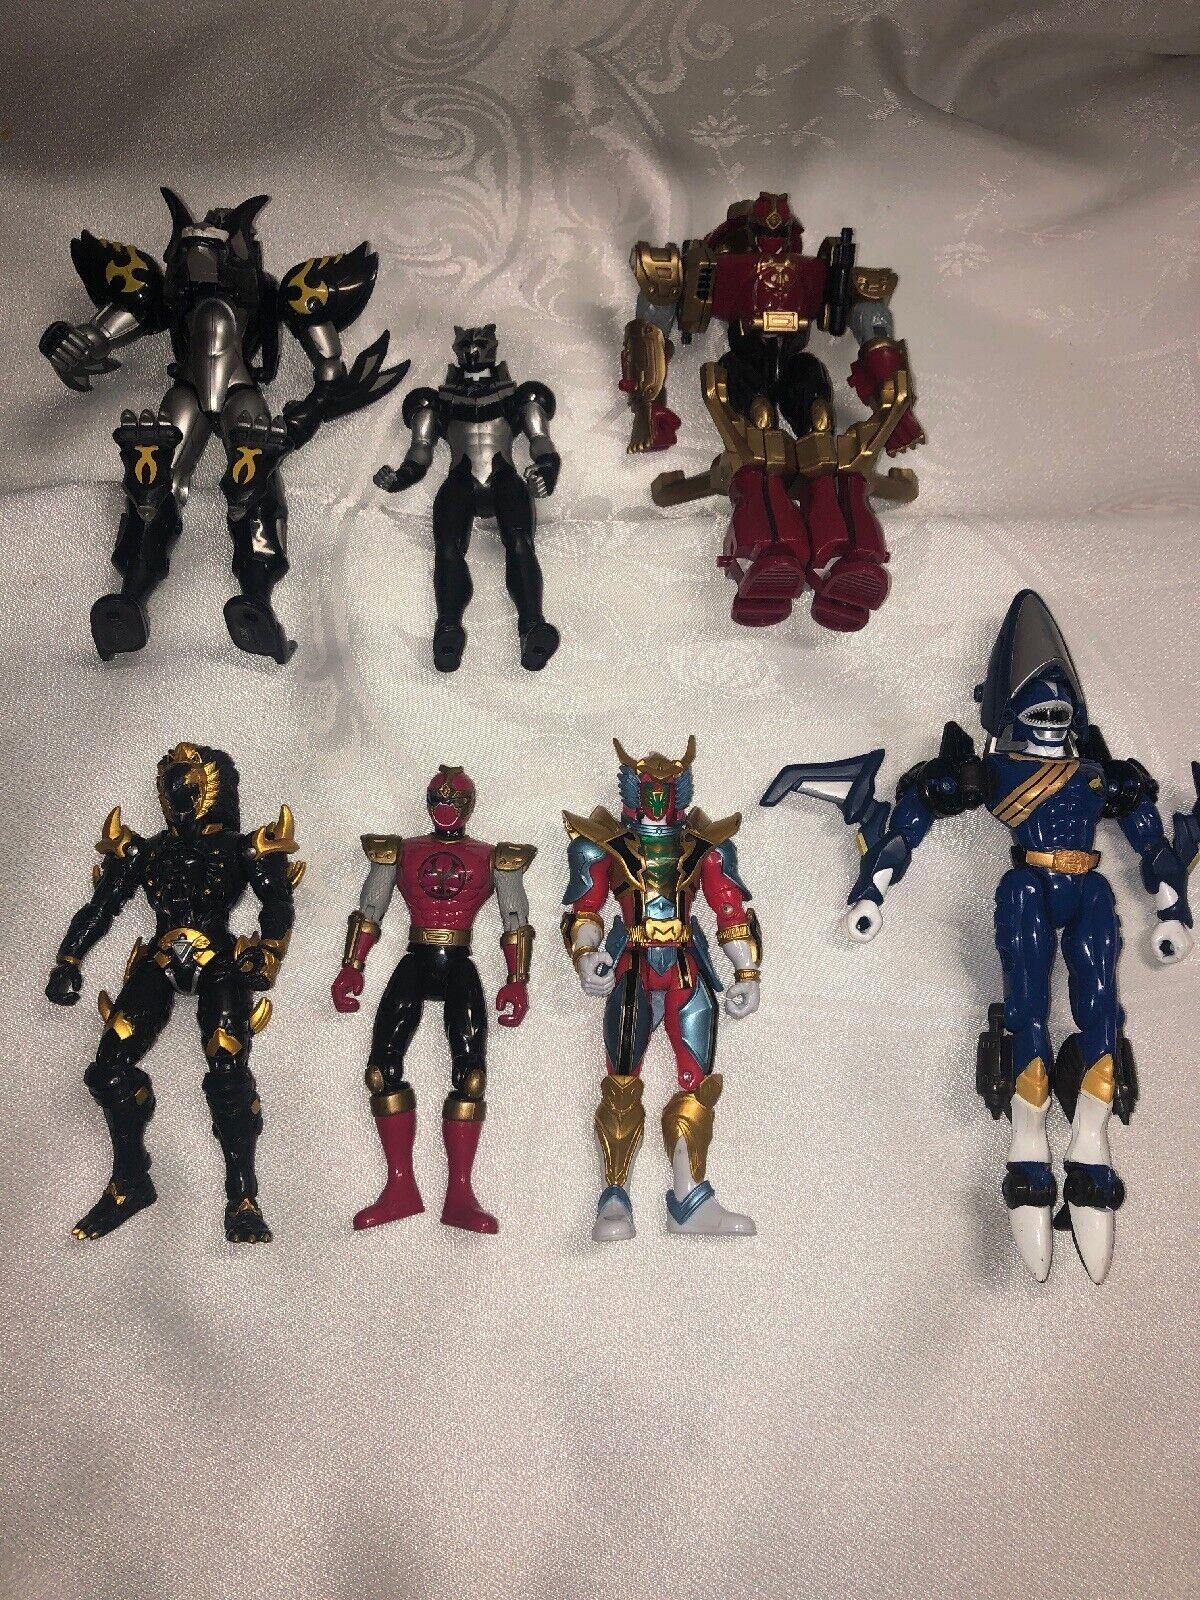 Mighty Morphin Power Rangers Figura de Acción LOTE DE 7 Excelente Estado Ver Lista